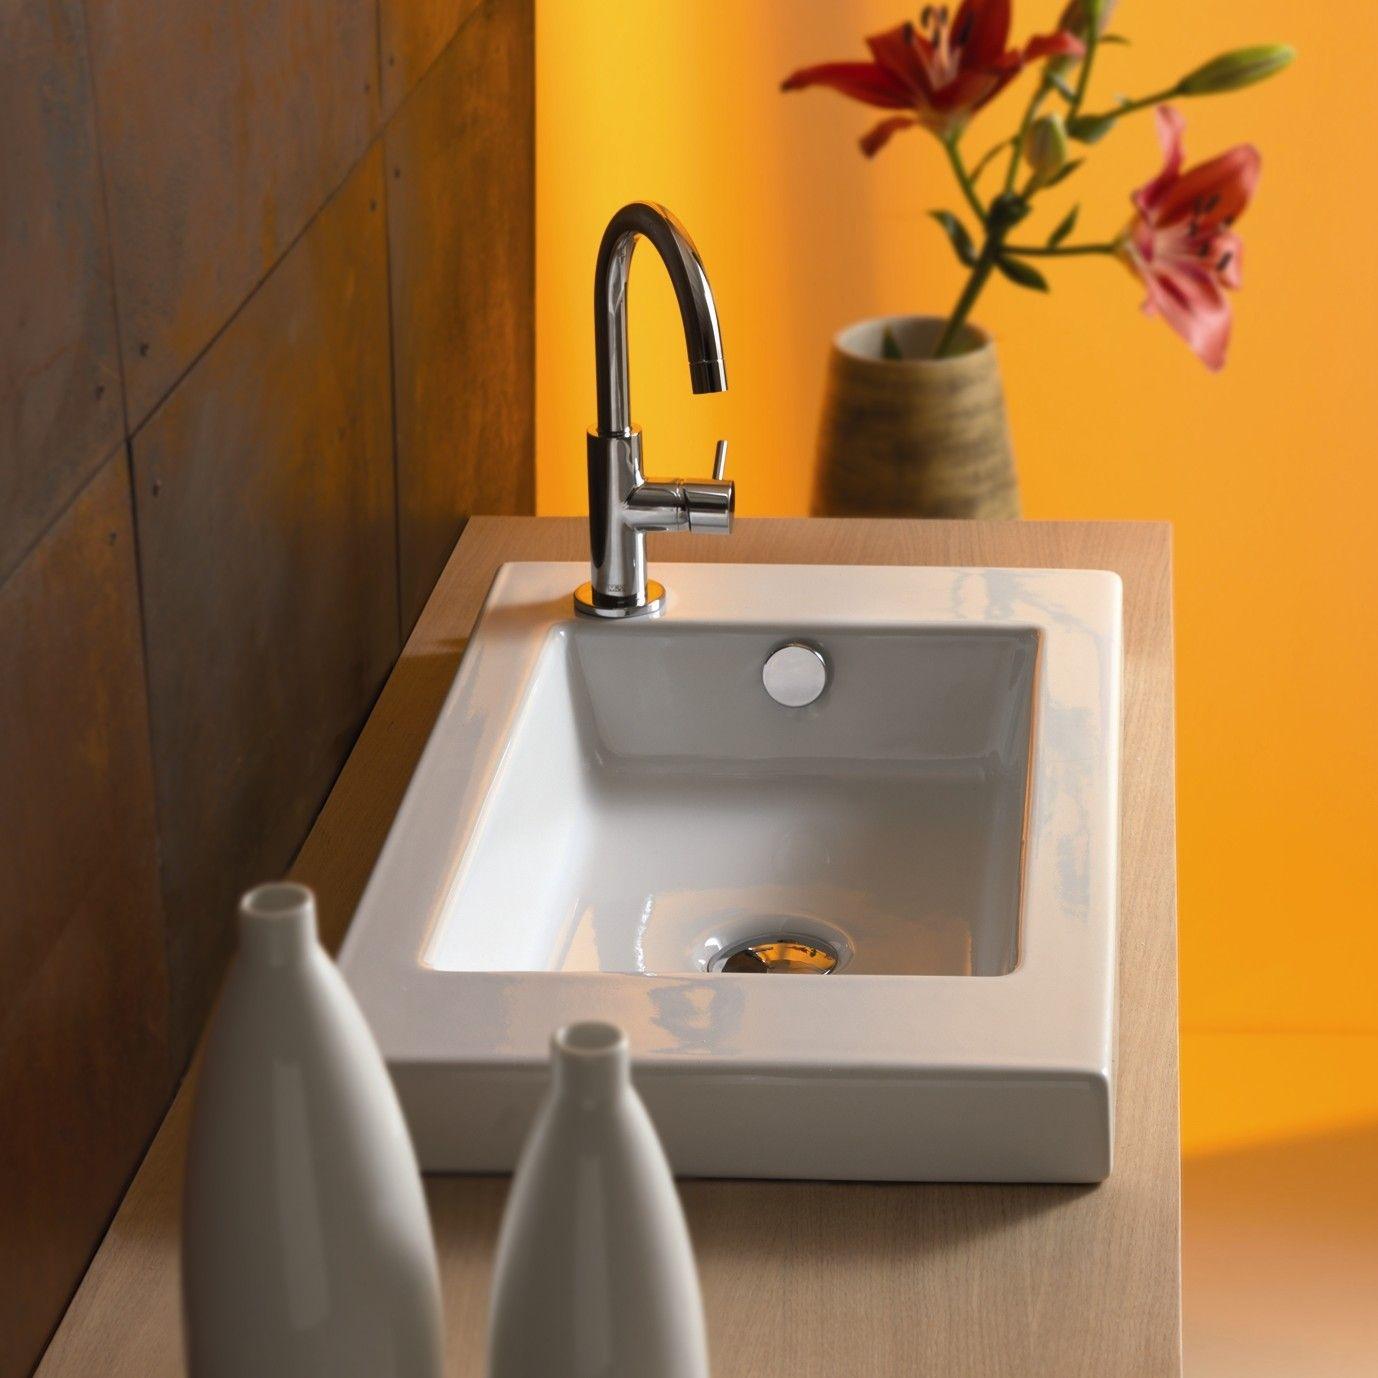 Ceramica Tecla Serie 35 Ceramic Bathroom Sink With Overflow Brilliant Wayfair Bathroom Sinks Decorating Inspiration